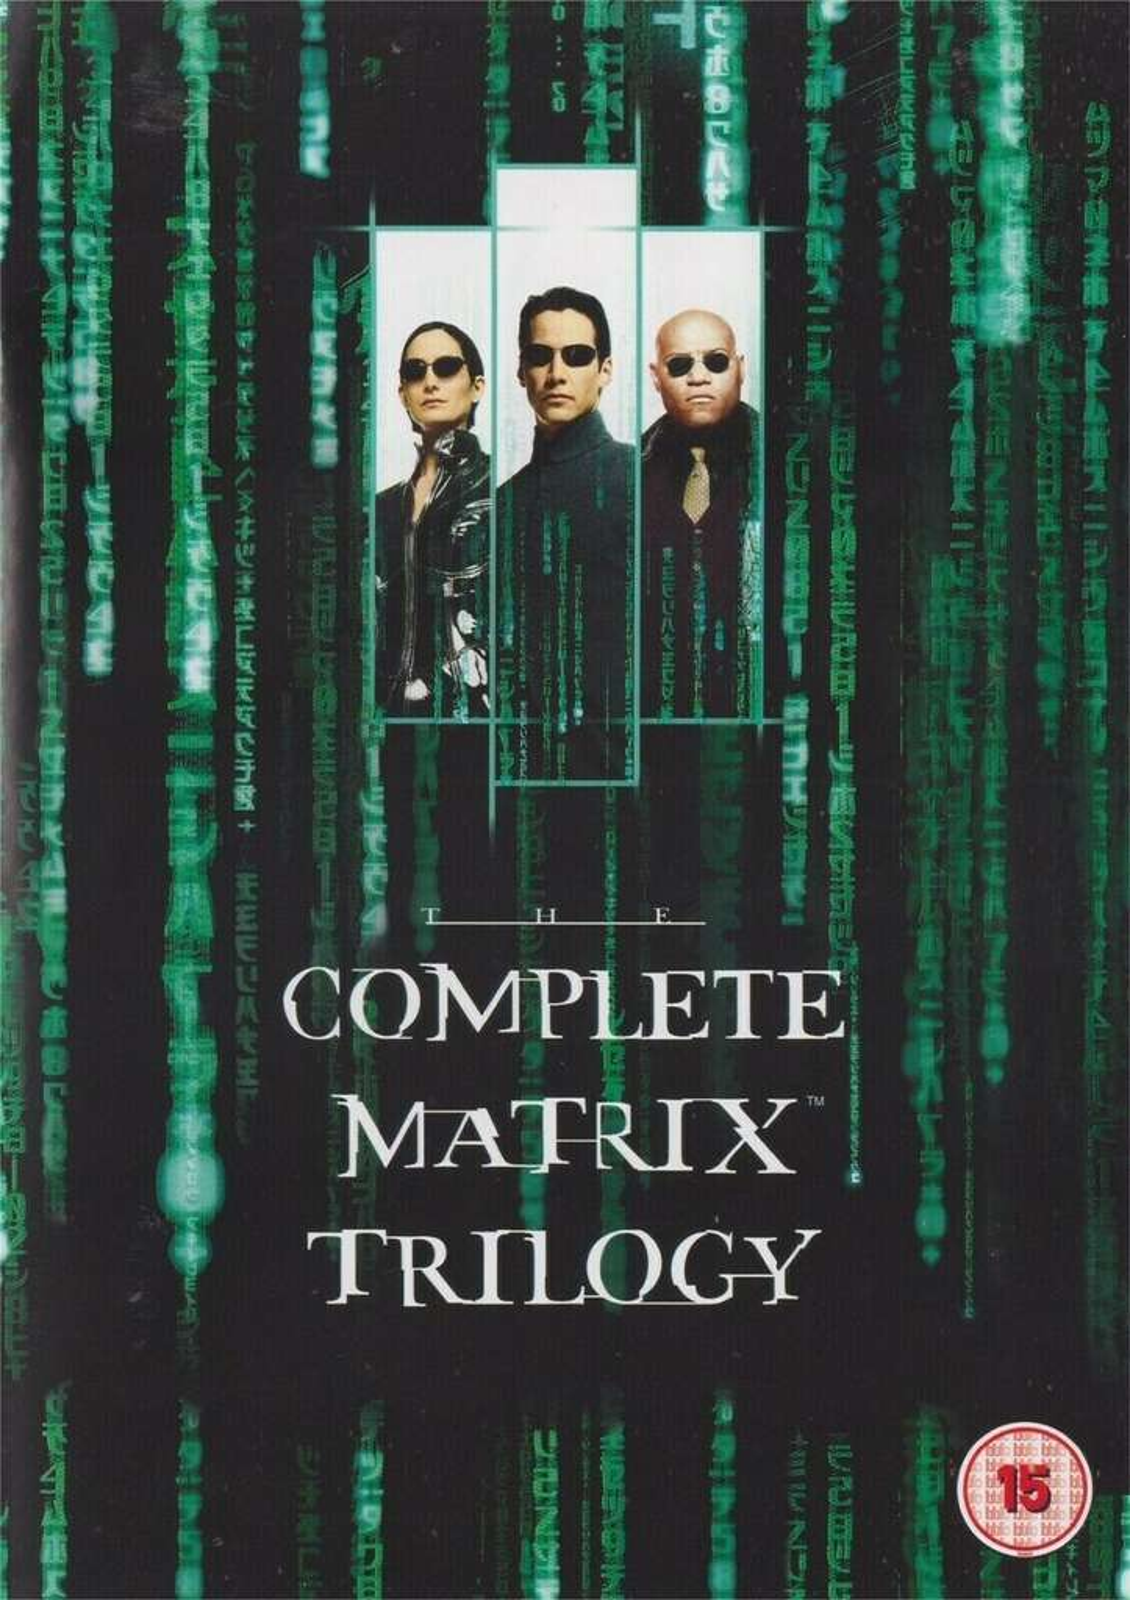 Matrix Trilogy - 3 Films Bundle in 4K (Stream via Apple TV) £9.99 @ iTunes Store - hotukdeals